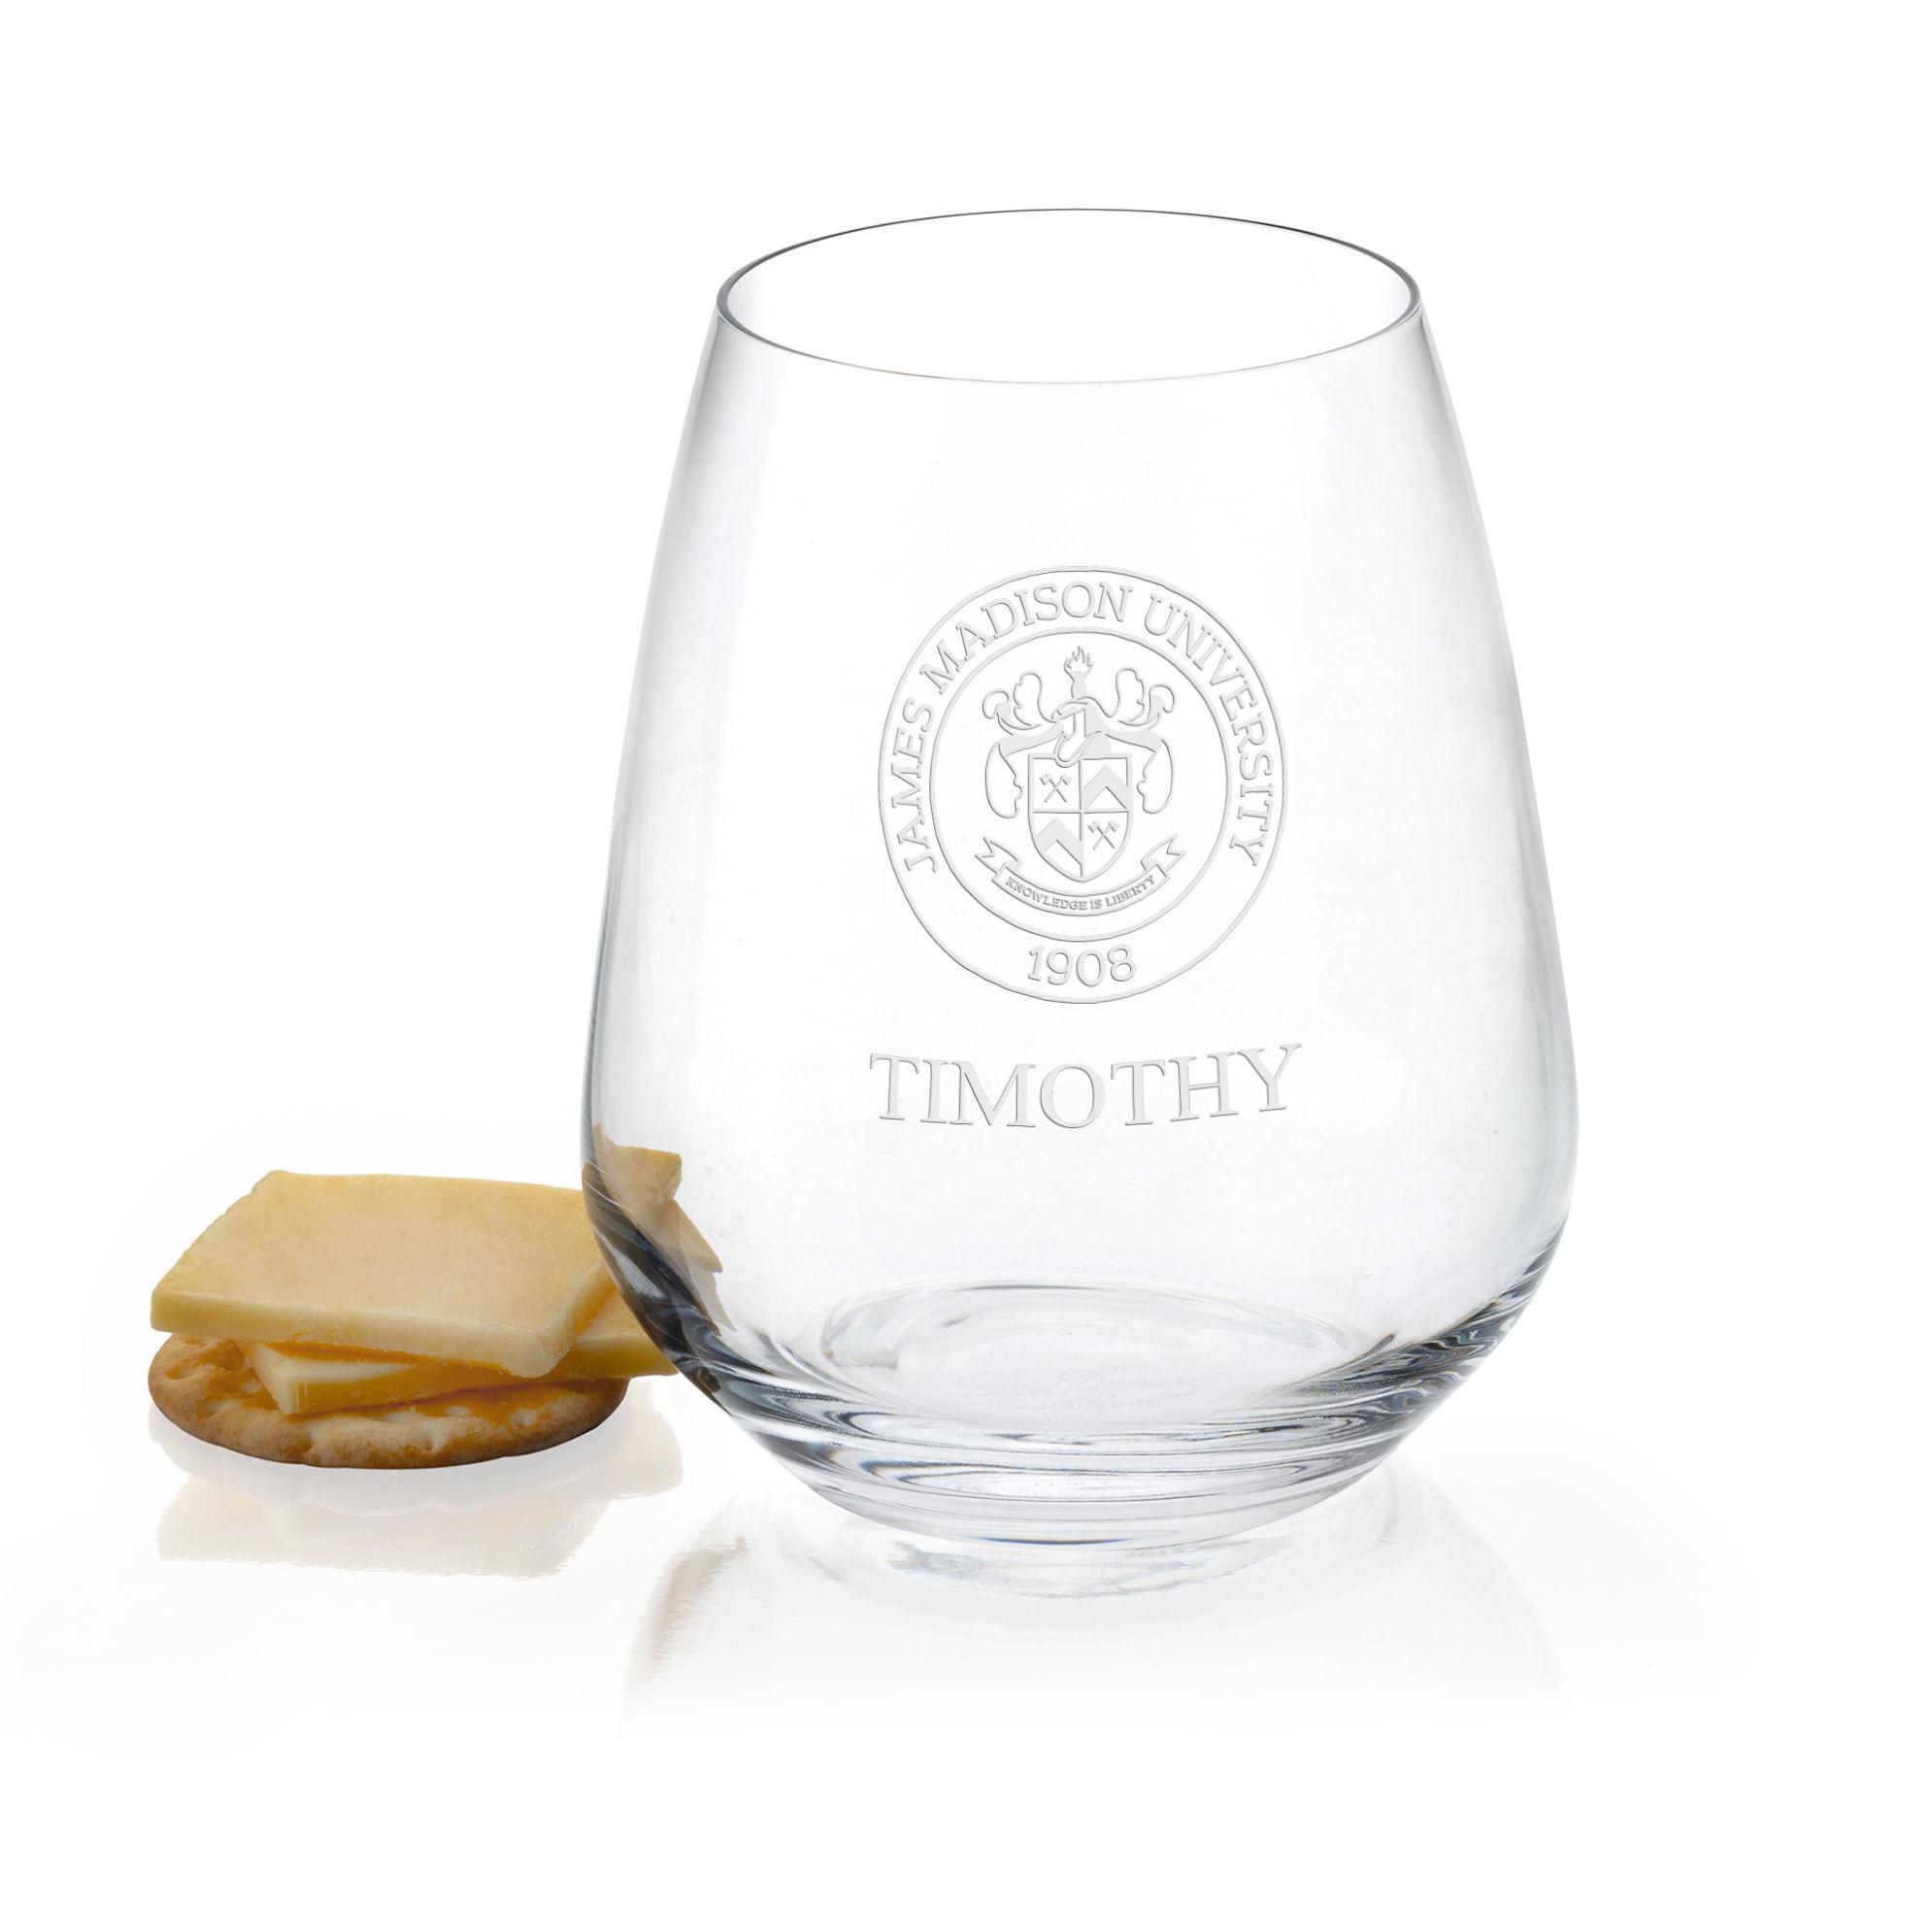 James Madison University Stemless Wine Glasses - Set of 2